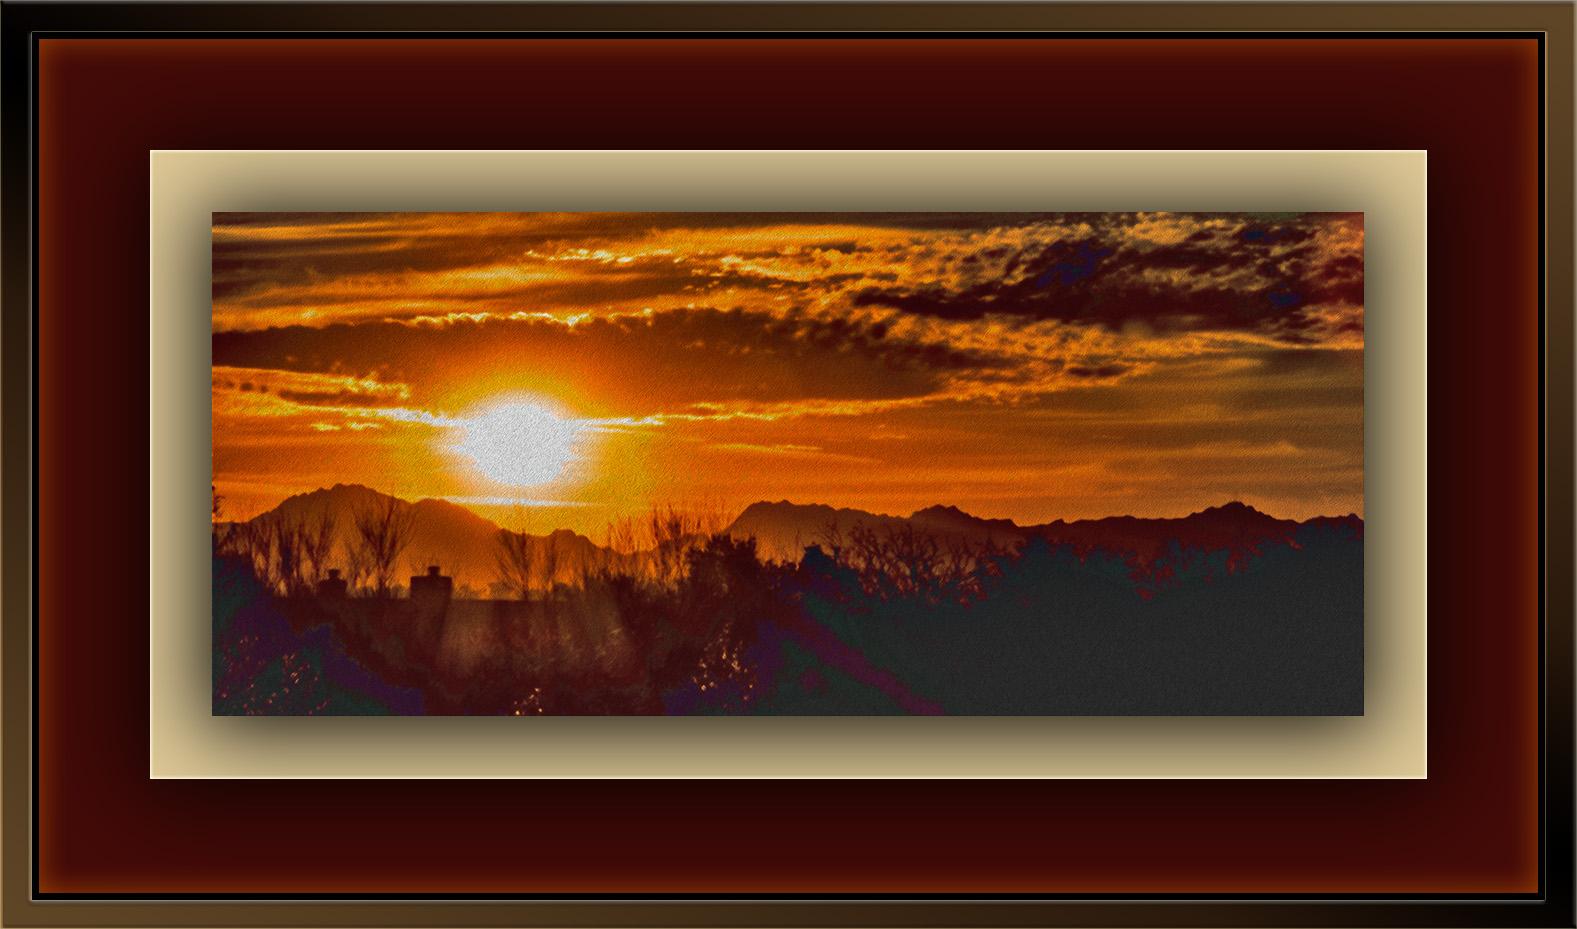 Sunset 02-19-16 (1 of 1)_art II blog